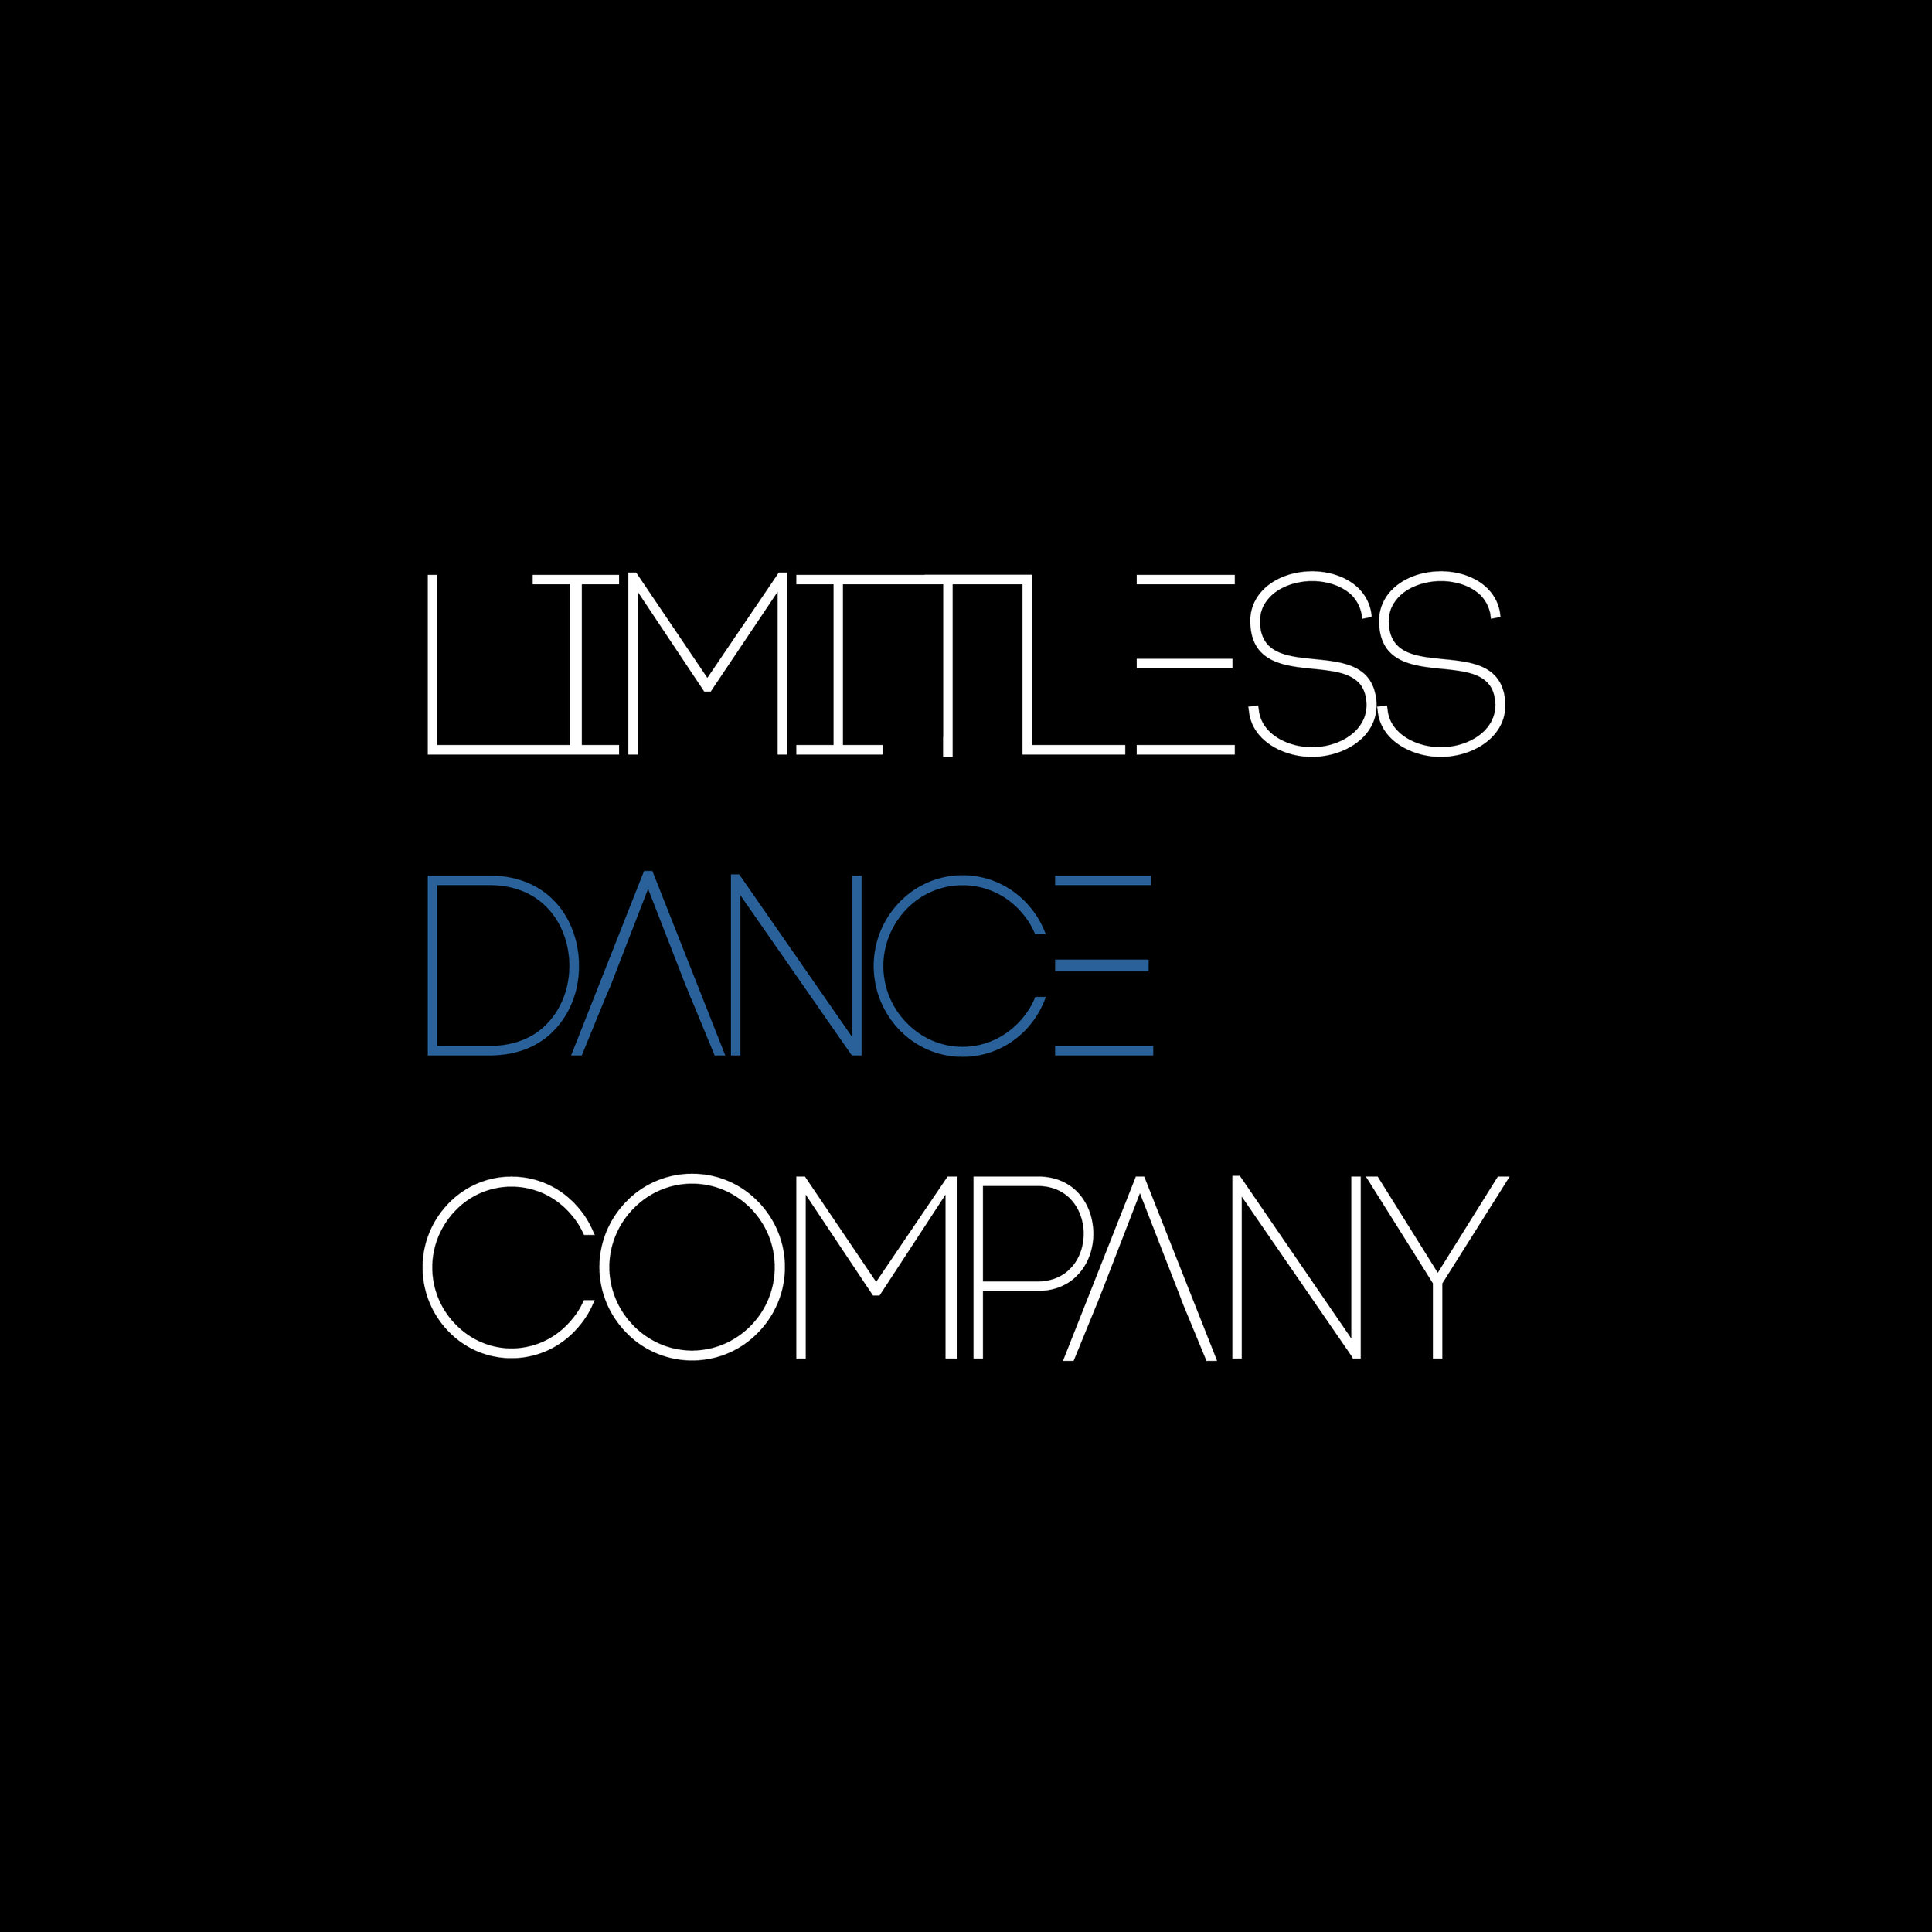 limitless_dance_company_2-02.jpg